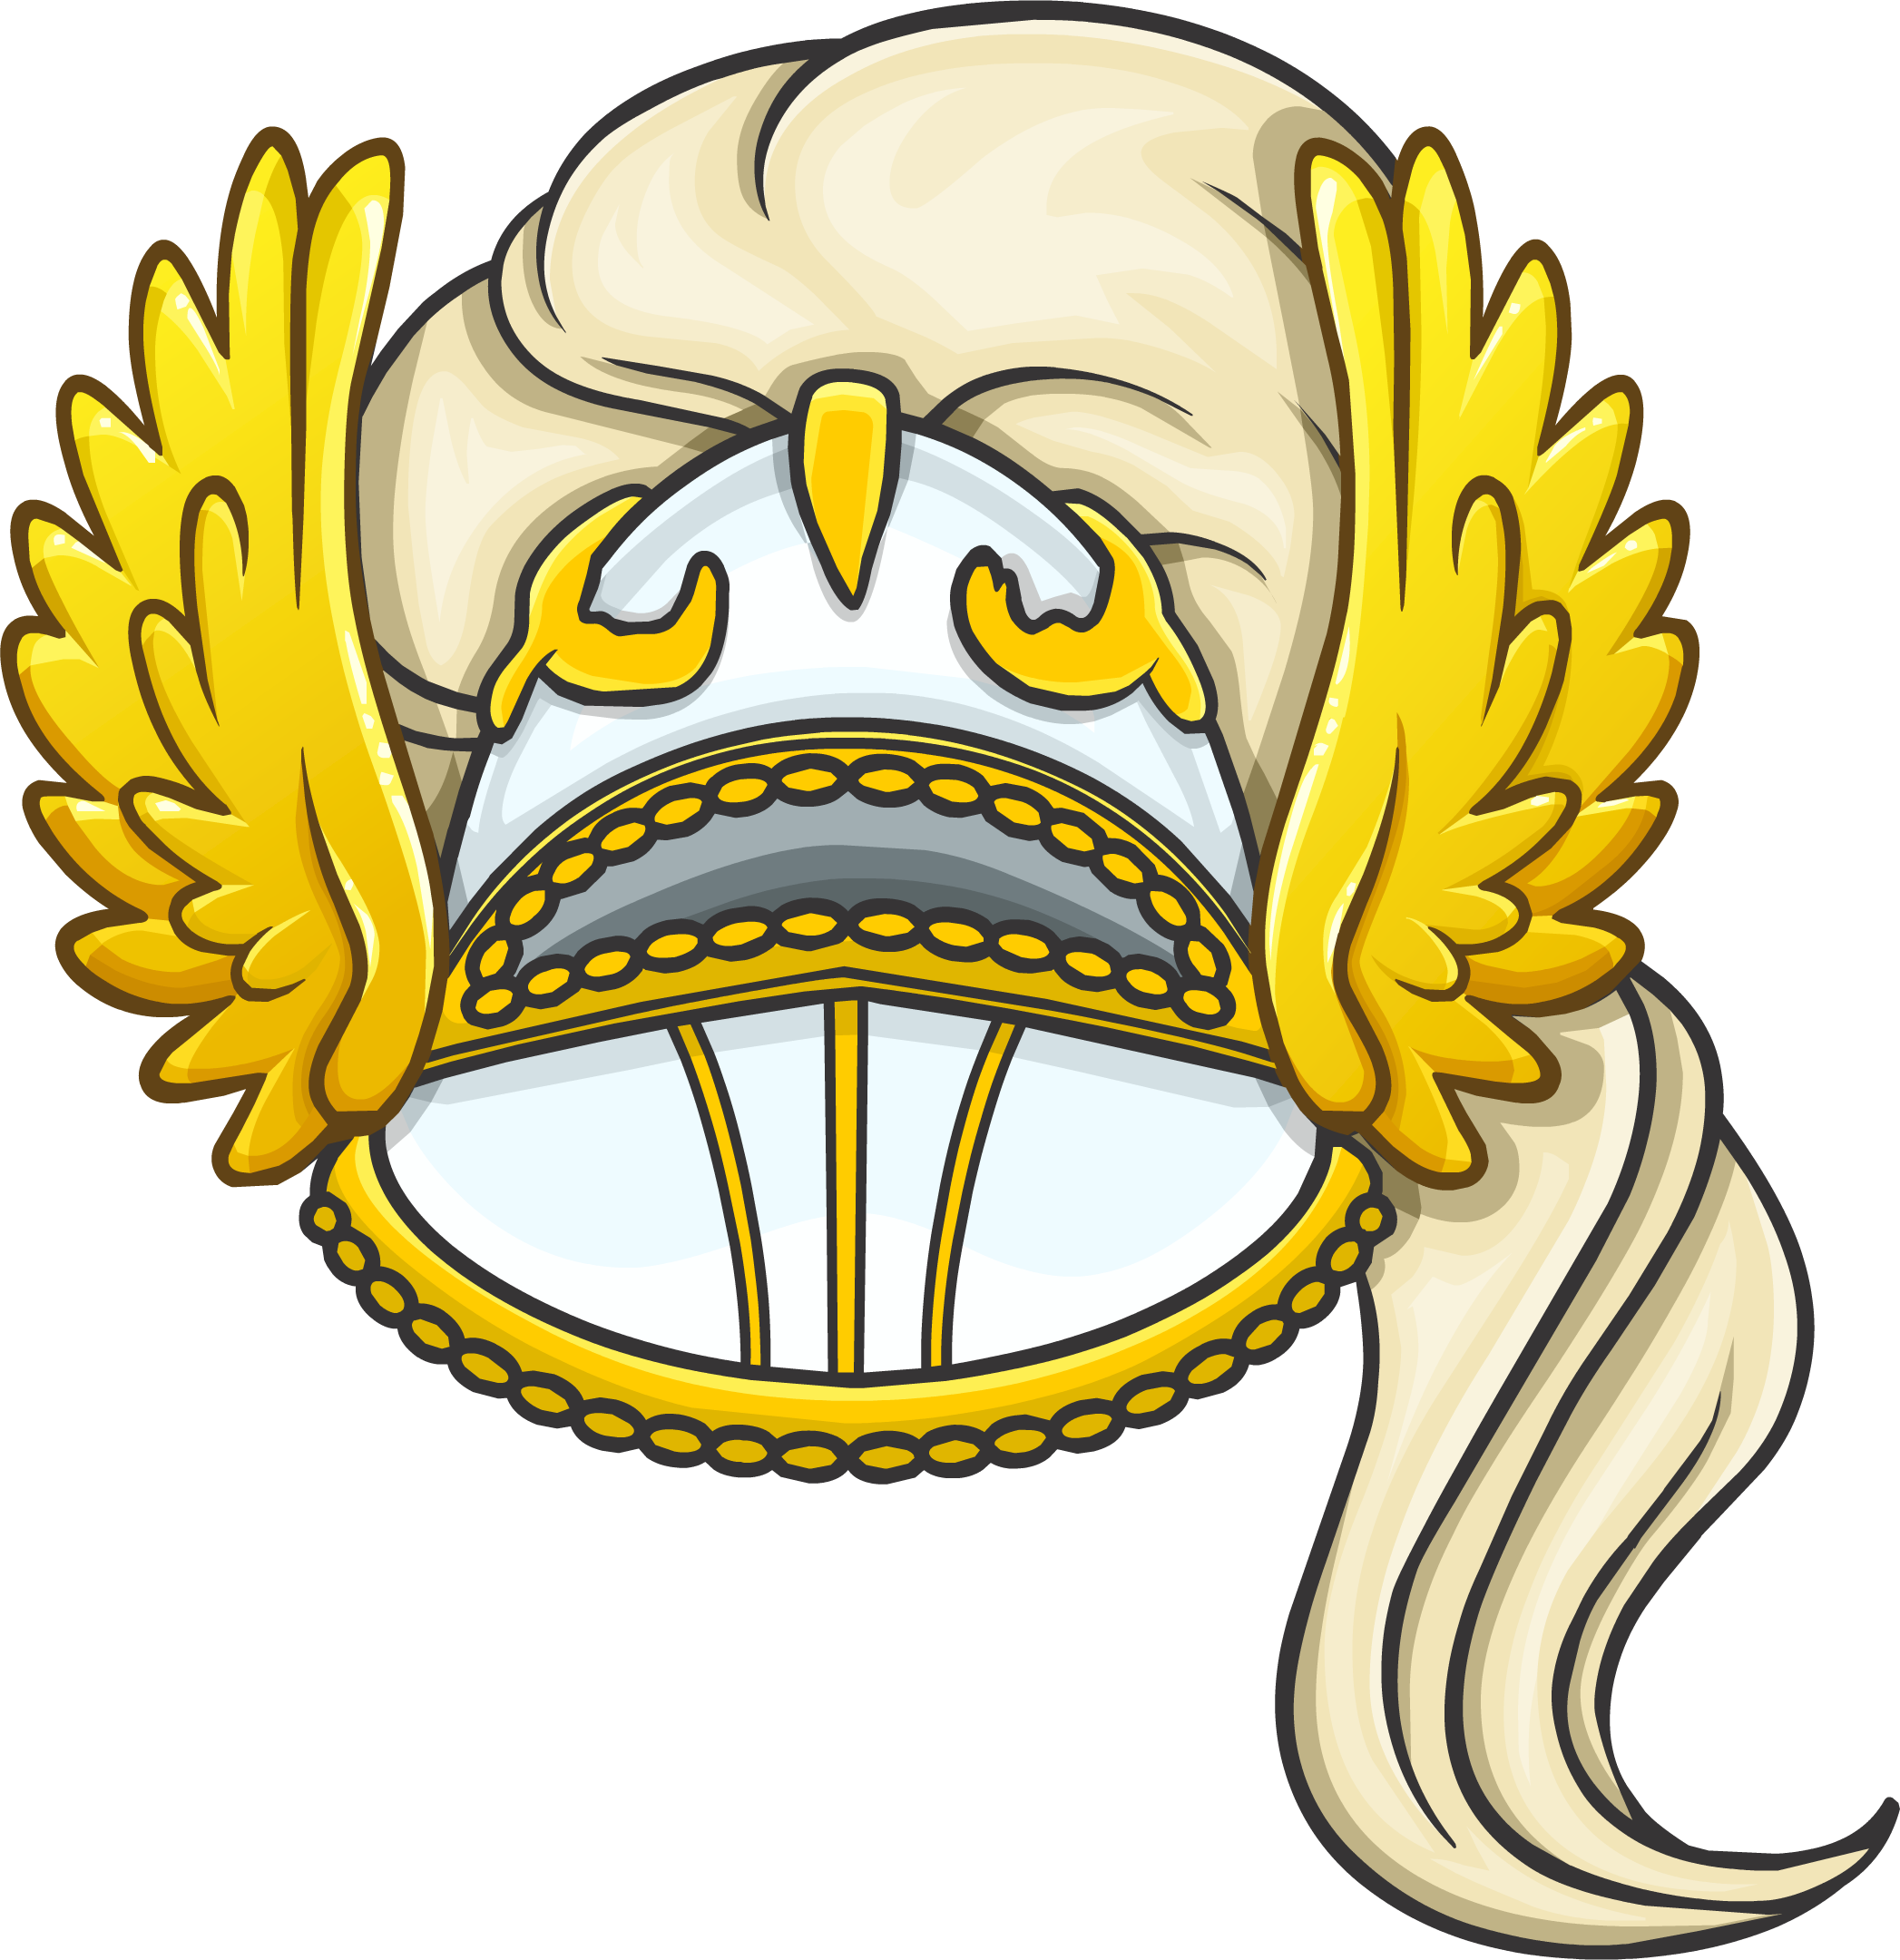 White Knight Helmet